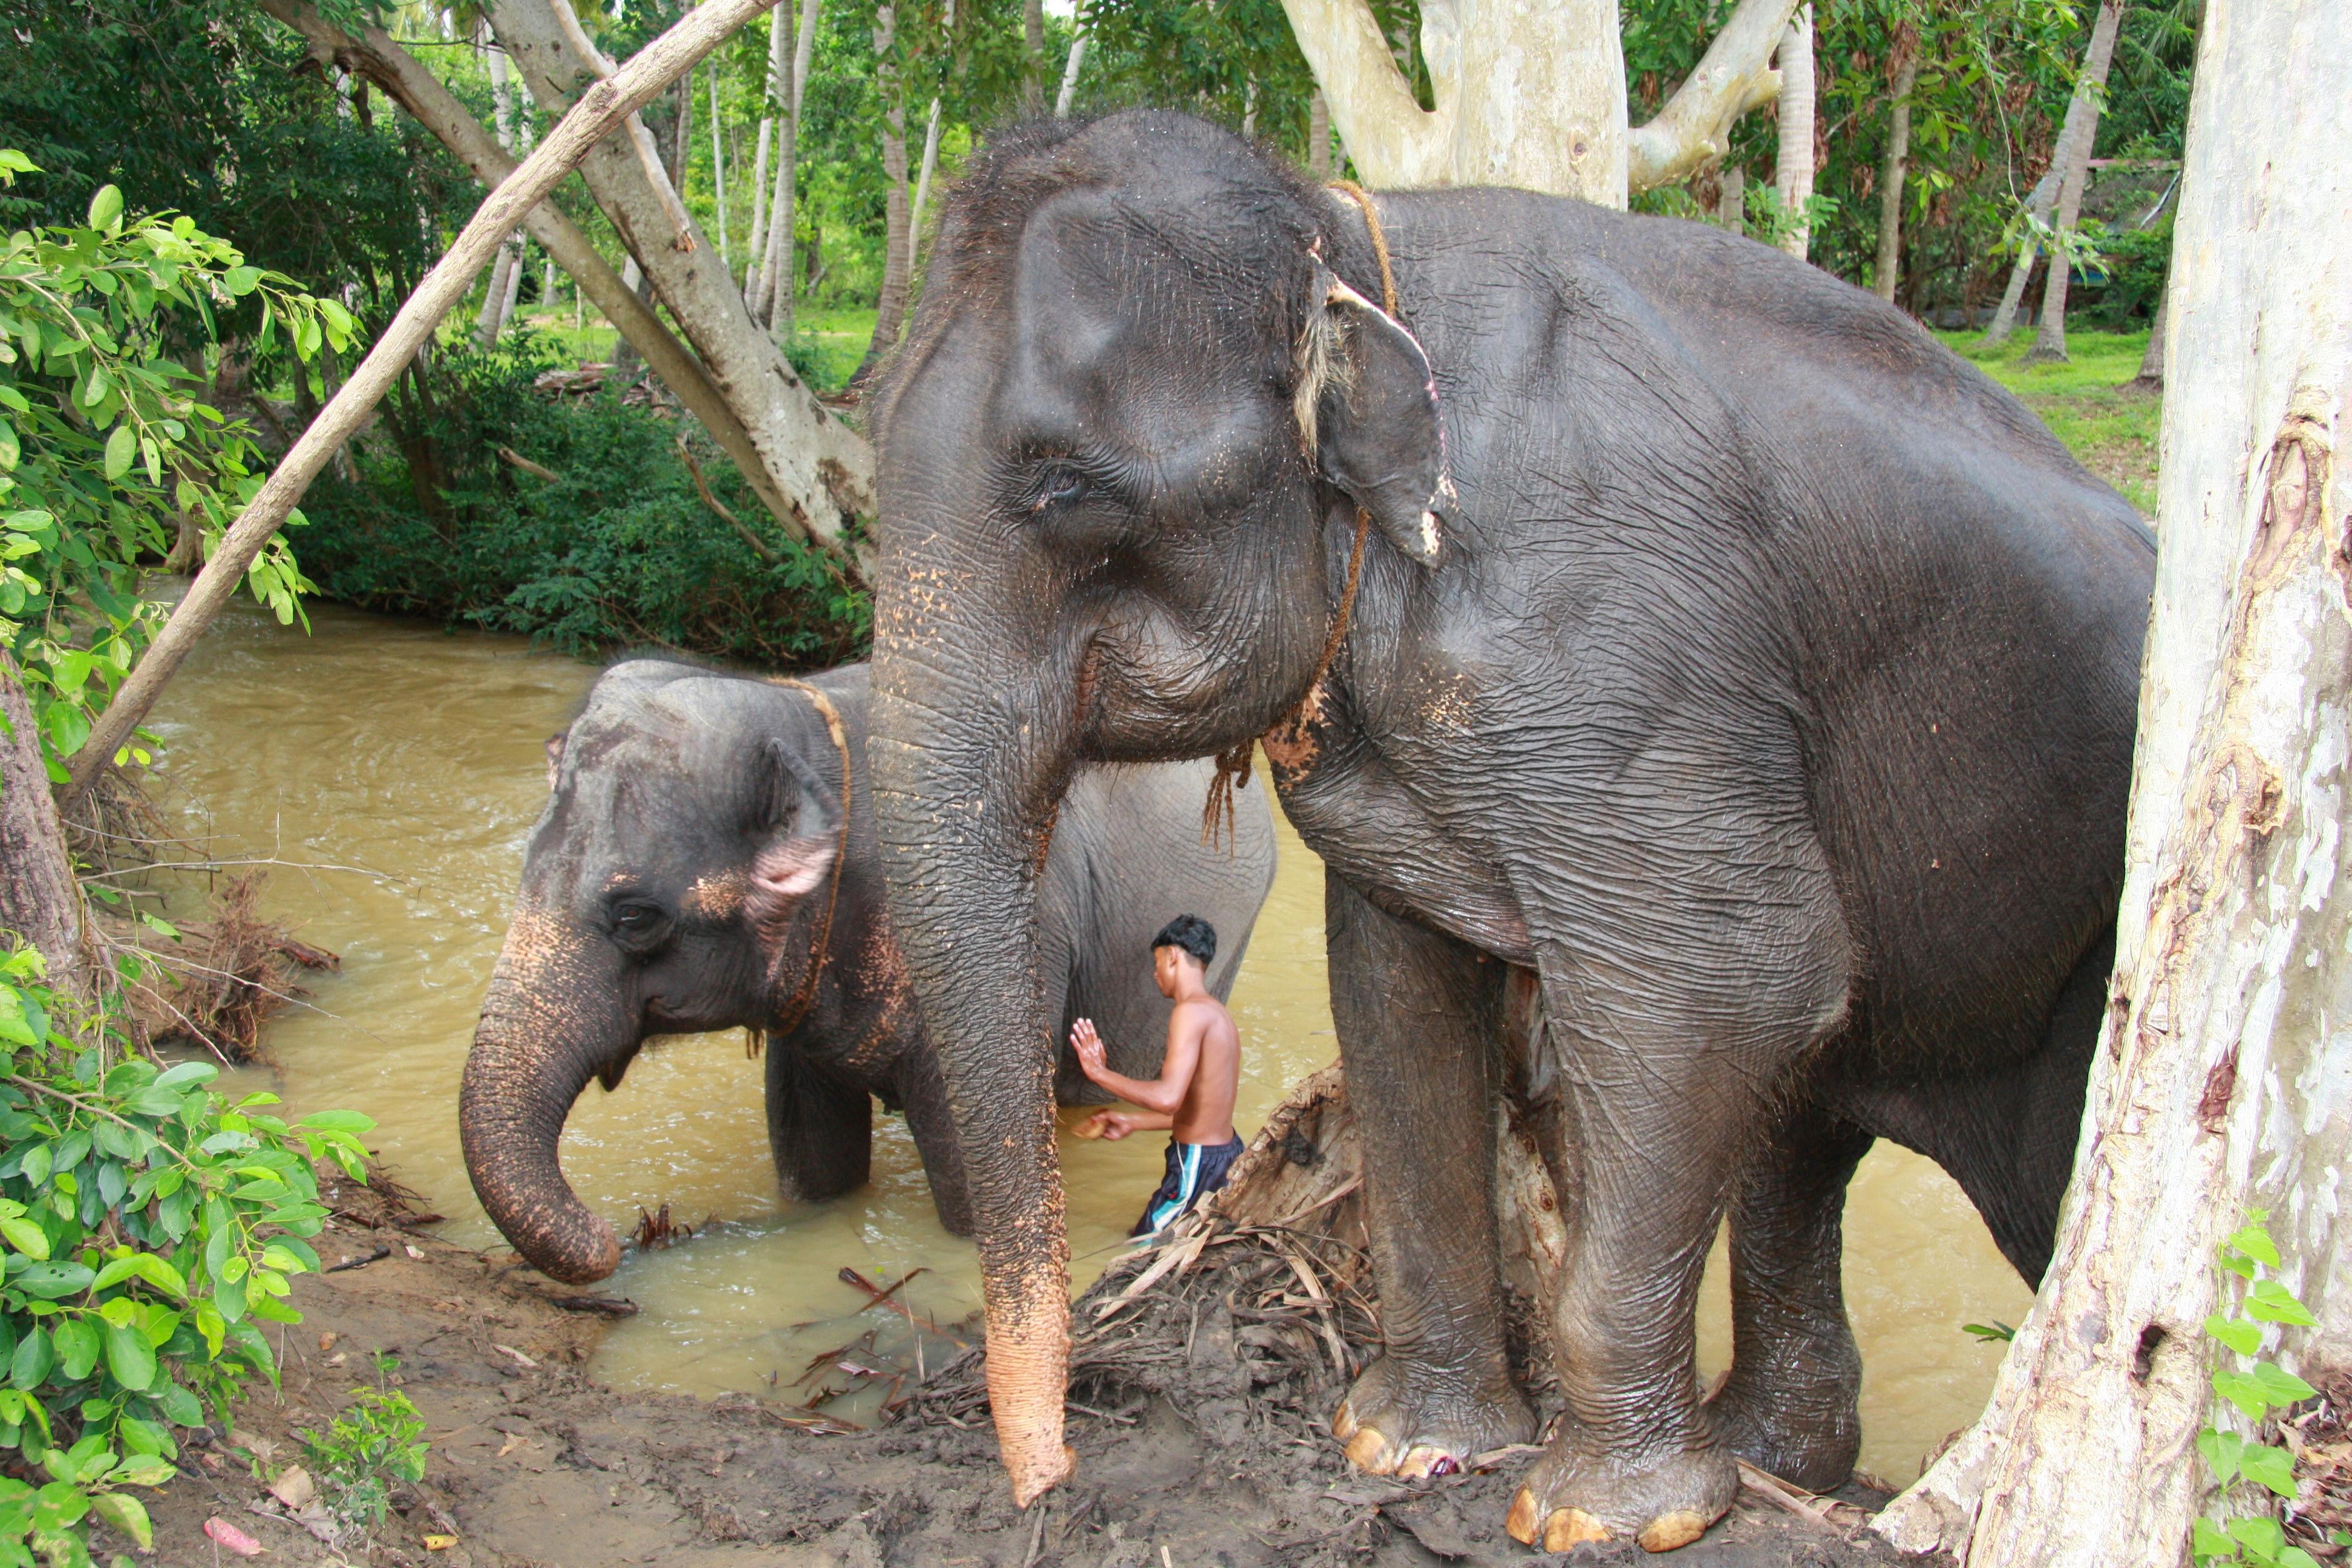 La Credenza Del Contadino Ruoti : Sri lanka perla o lacrimau d e kumbh mela in india kel